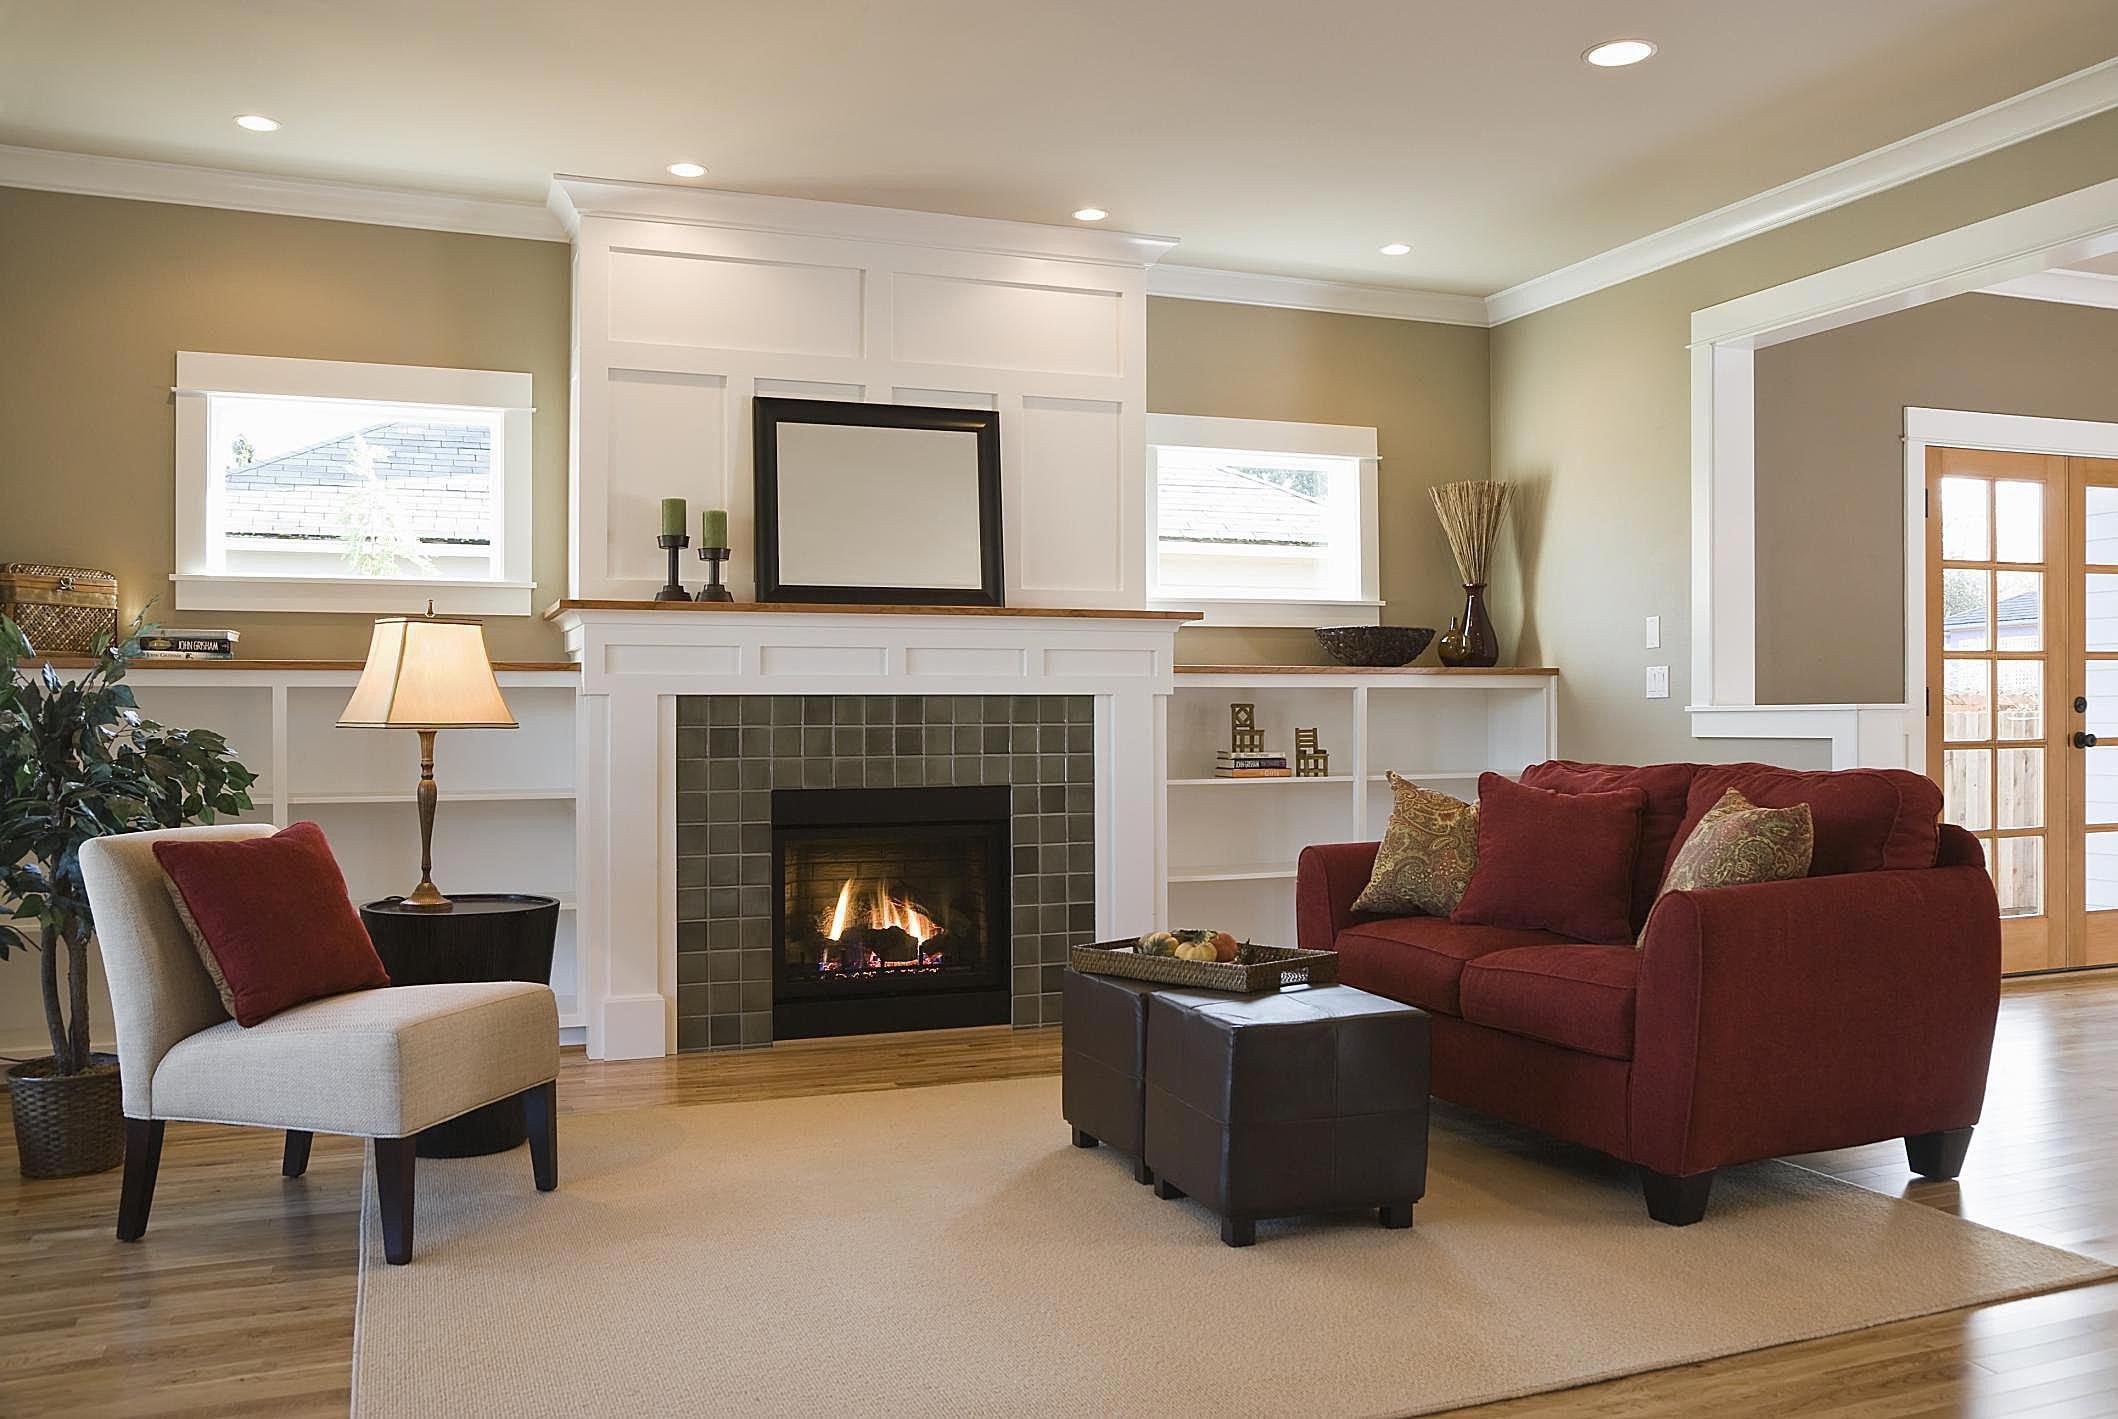 Budget Living Room Decorating Ideas Fresh Bud Living Room Design Inspiration